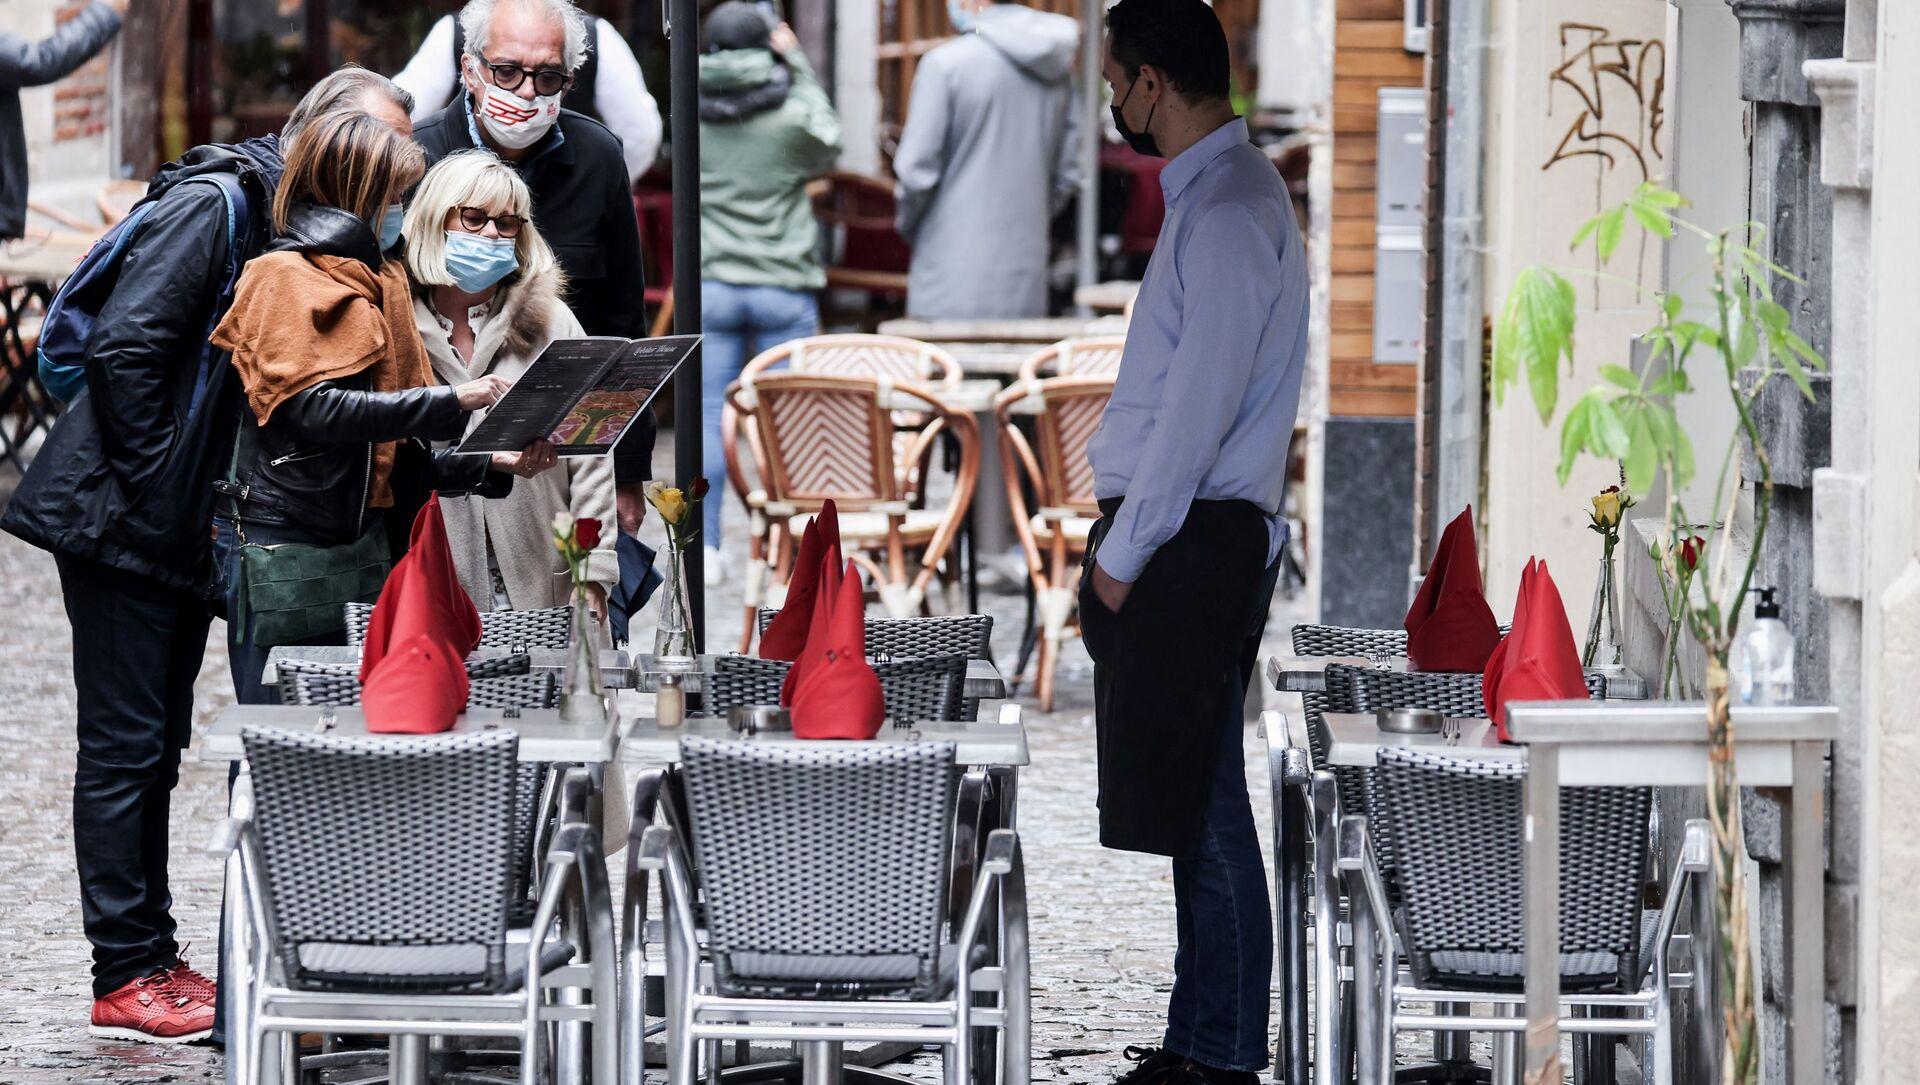 Официант ждет клиентов на террасе ресторана в Брюсселе  - Sputnik Беларусь, 1920, 12.05.2021